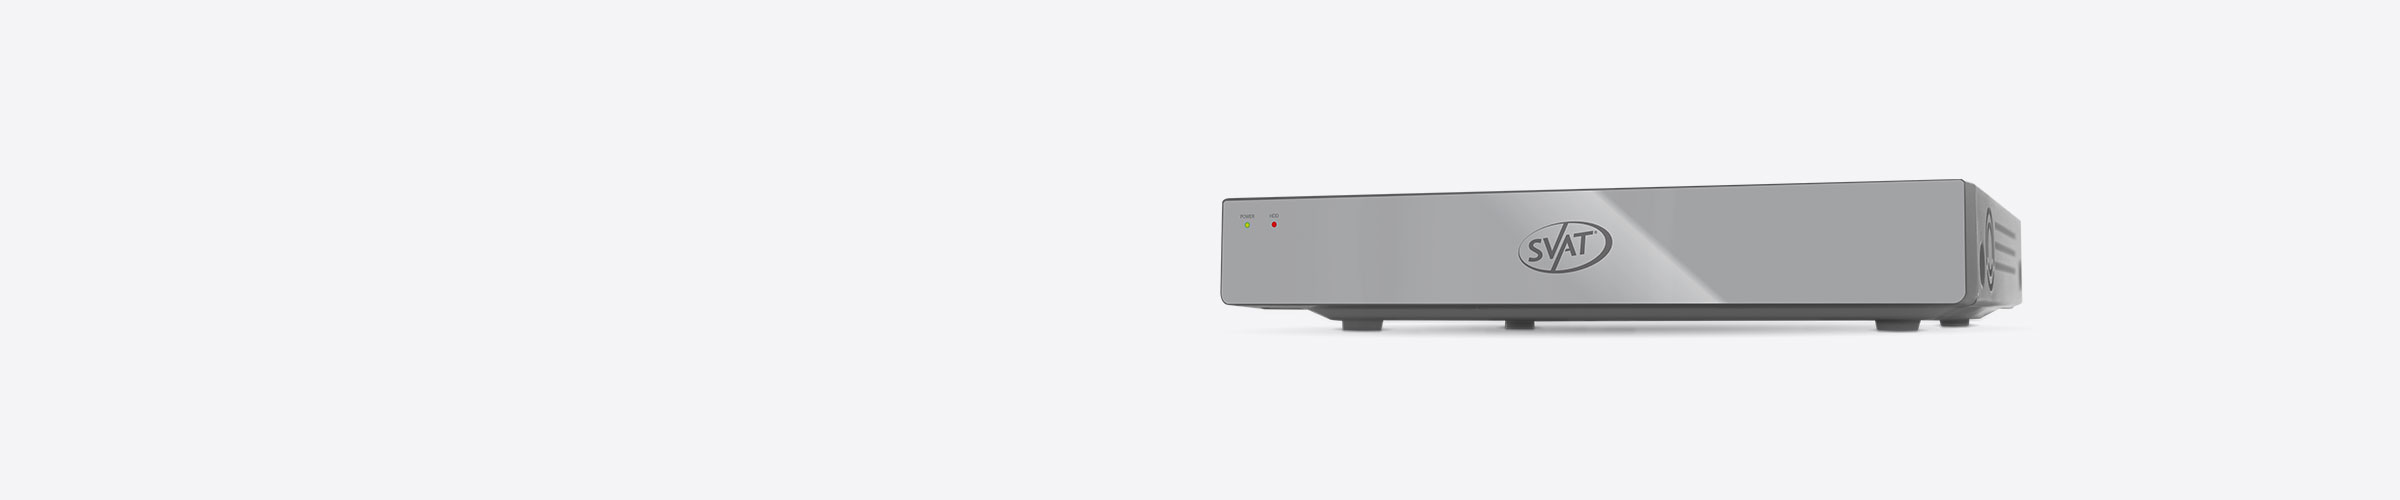 4CH Smart Security DVR